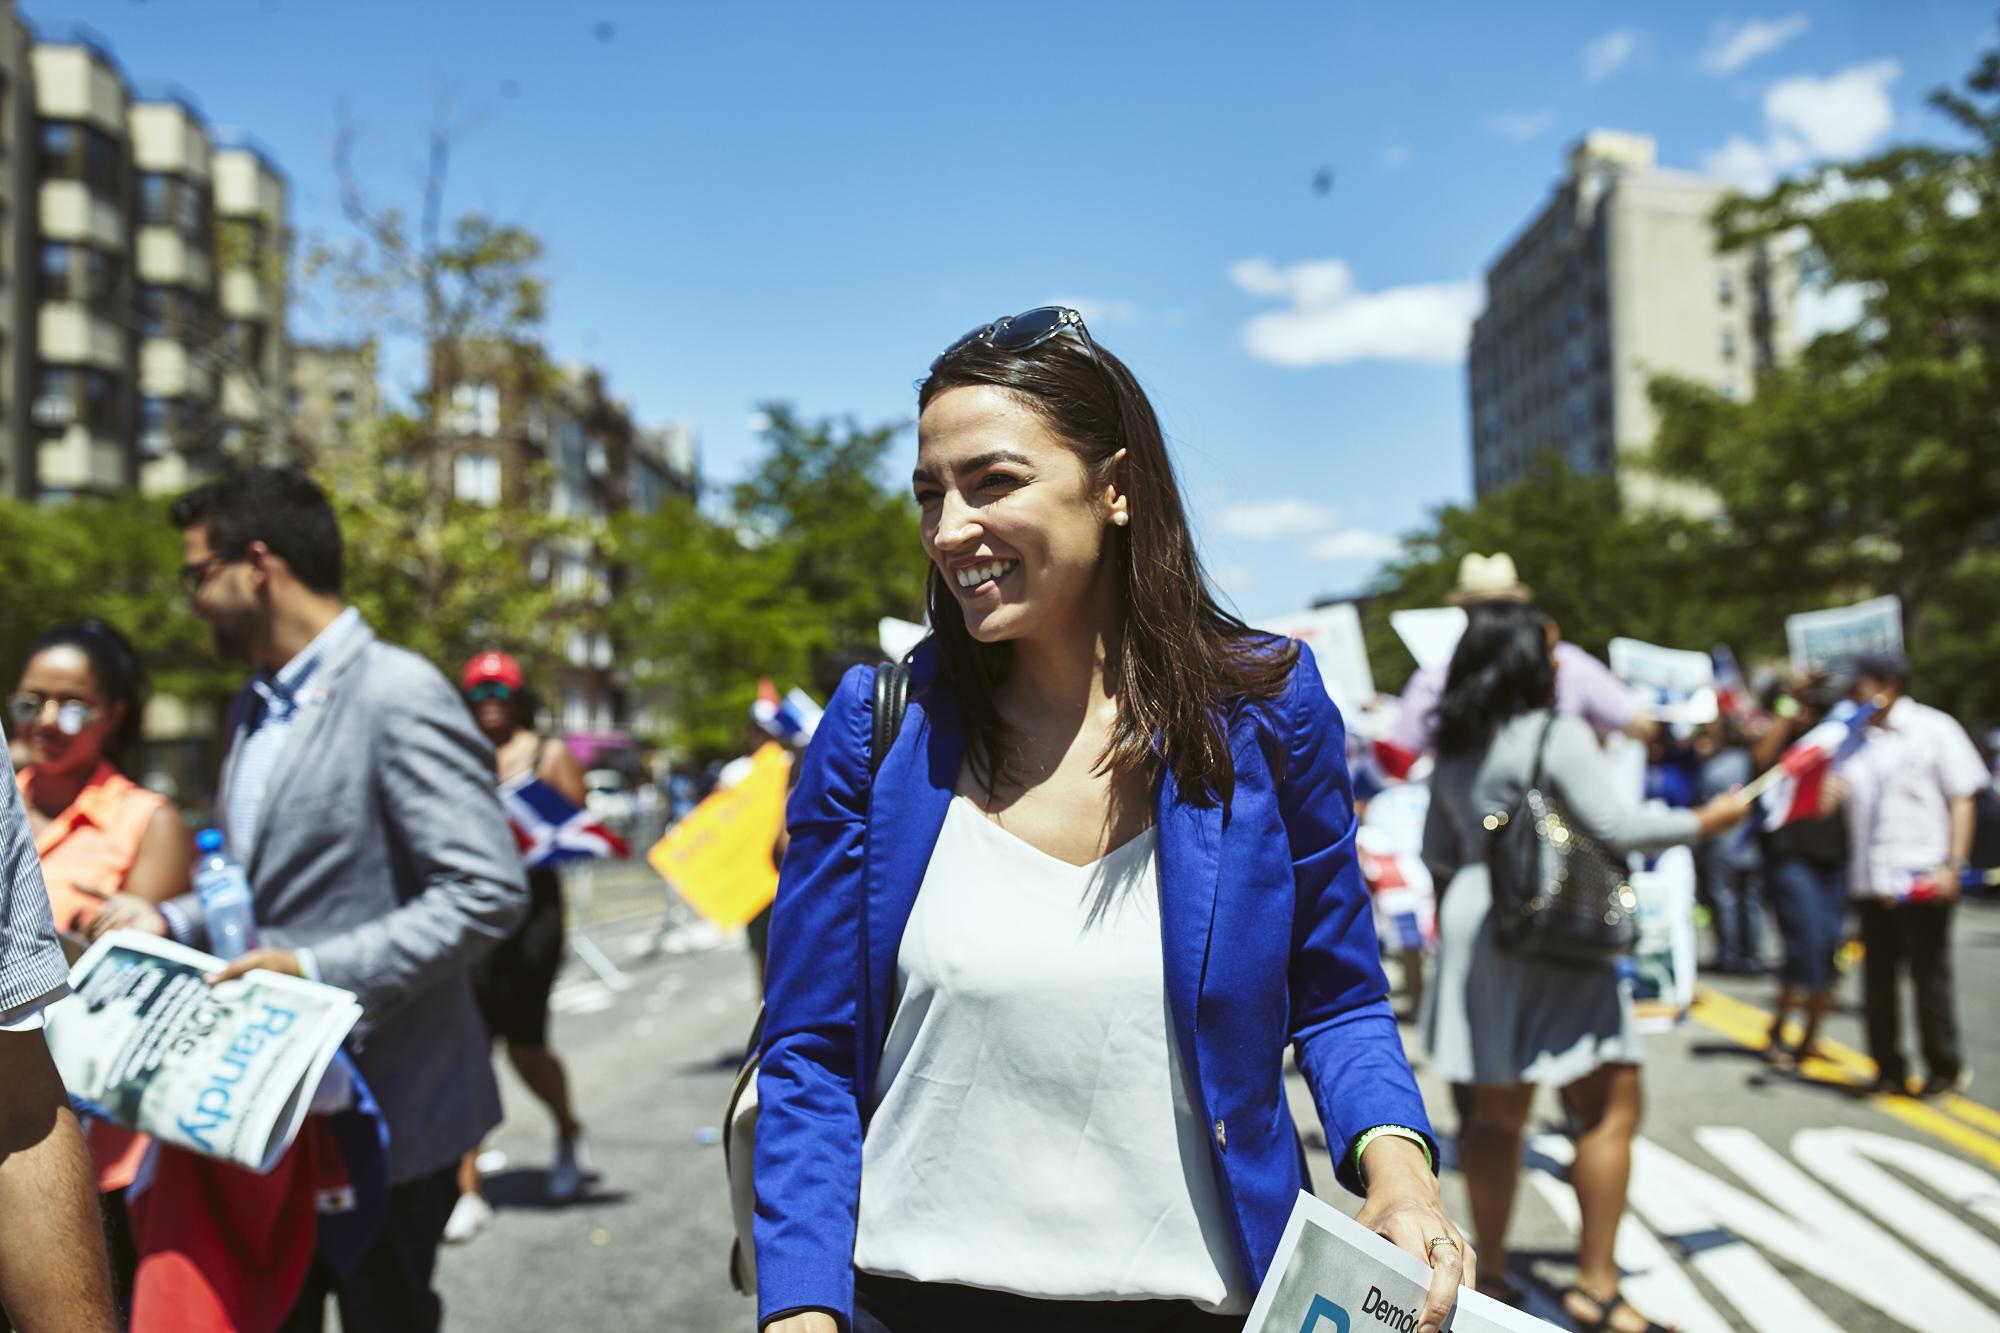 U.S. Rep. Alexandria Ocasio-Cortez.Photo by Jose Alvarado via the Ocasio-Cortez campaign.